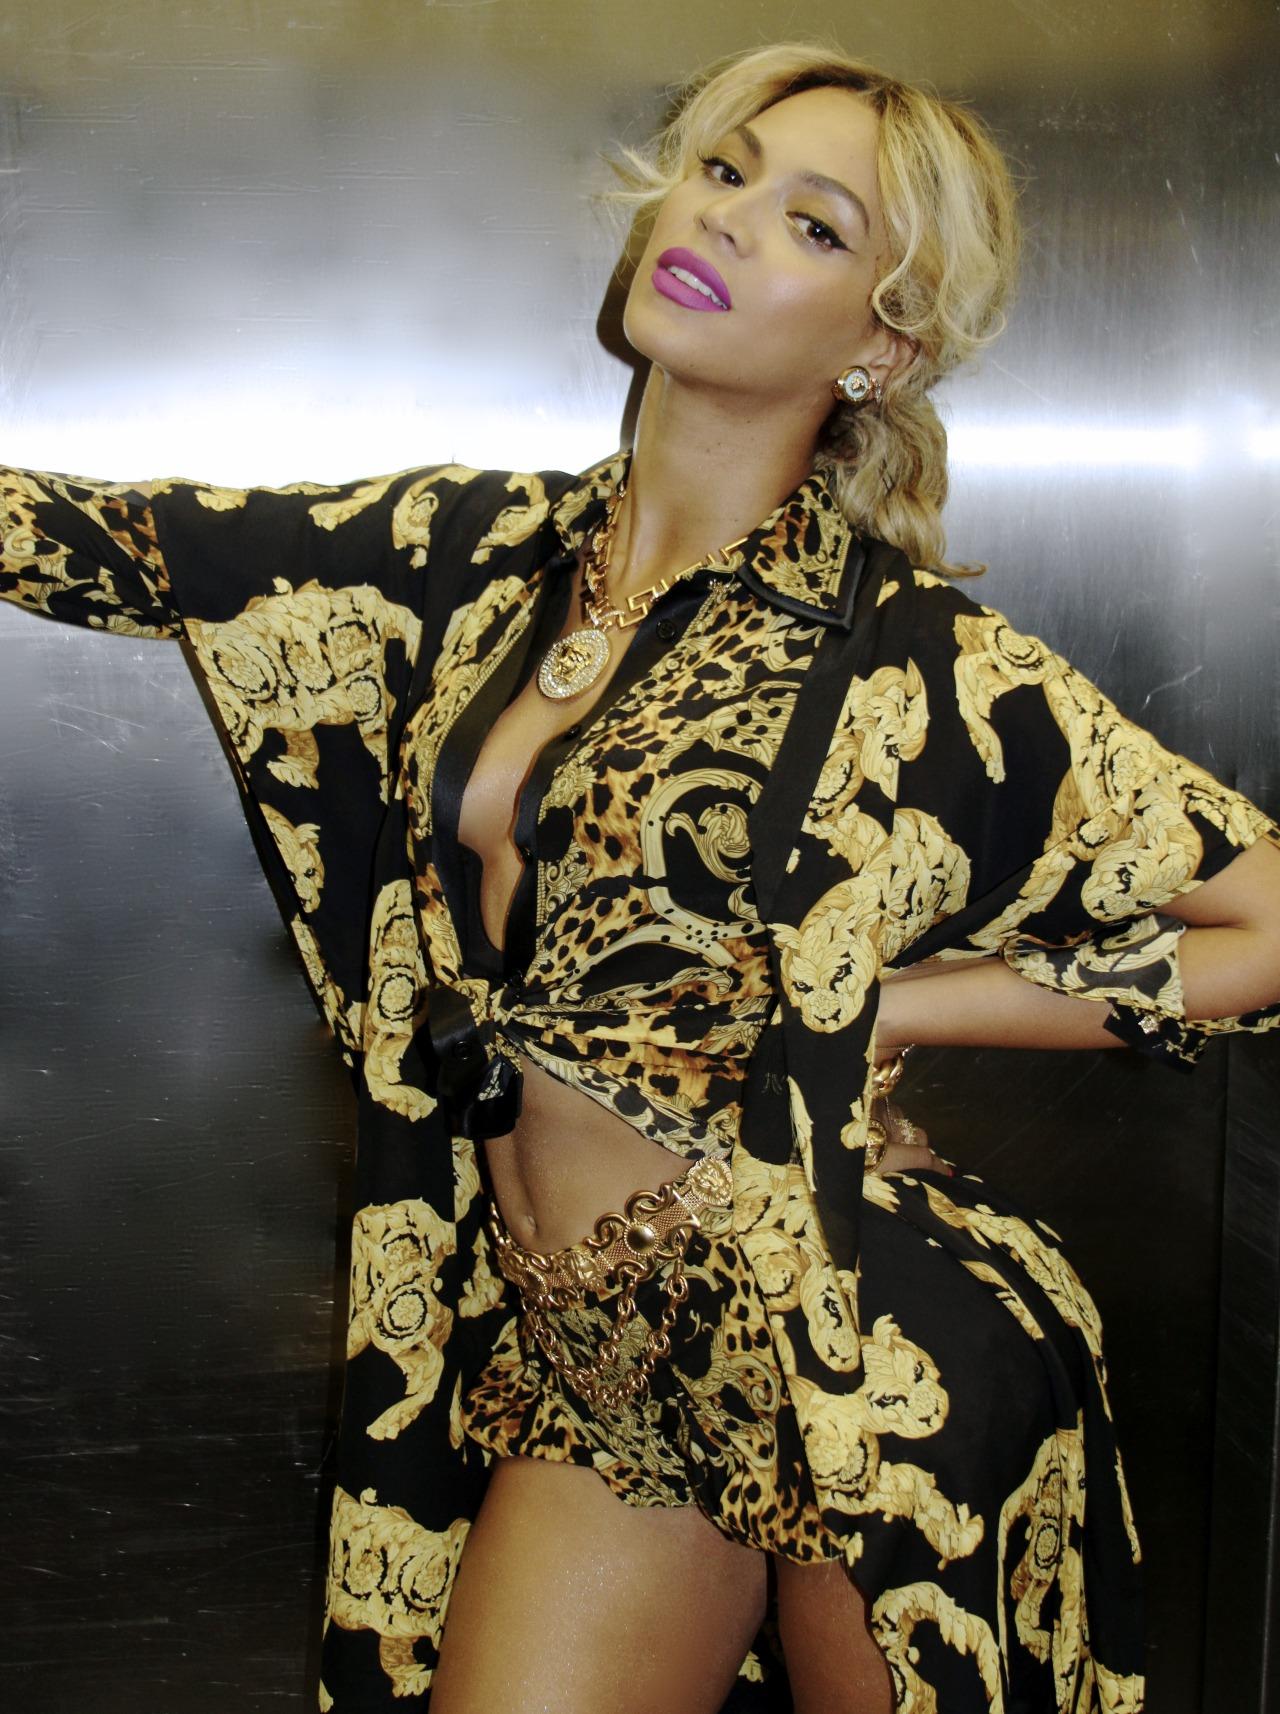 Beyoncé - Twitter (@Beyonce), Instagram (Baddiebey), Tumblr (I Am...) [II] Tumblr_mzgcjoAYzl1rqgjz2o1_1280